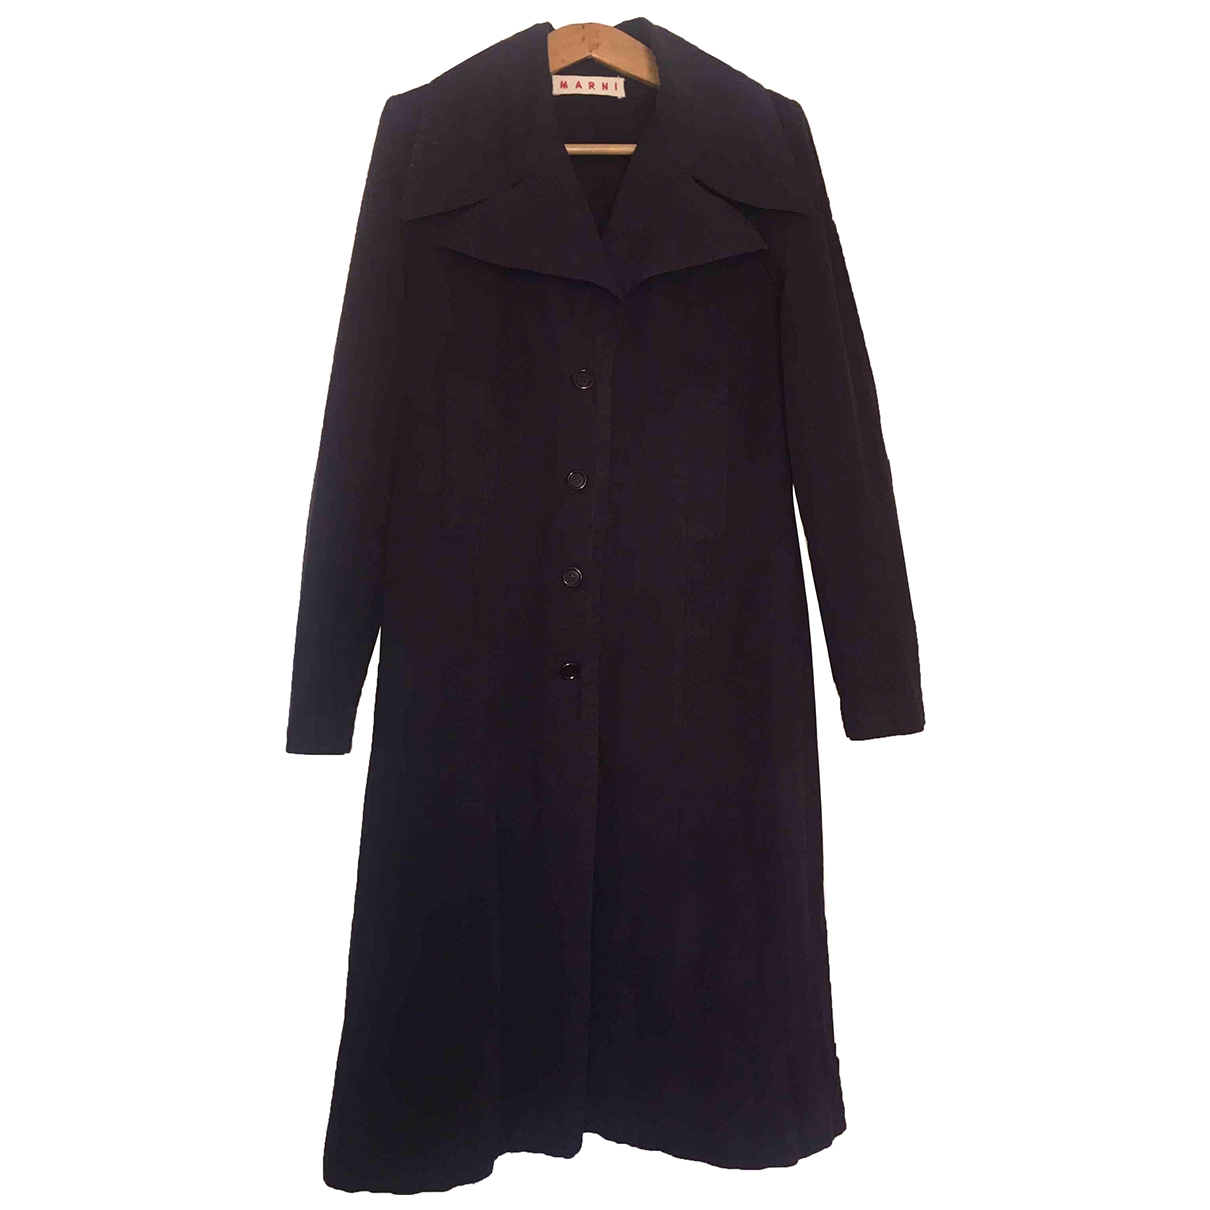 Marni \N Cotton coat for Women 44 IT